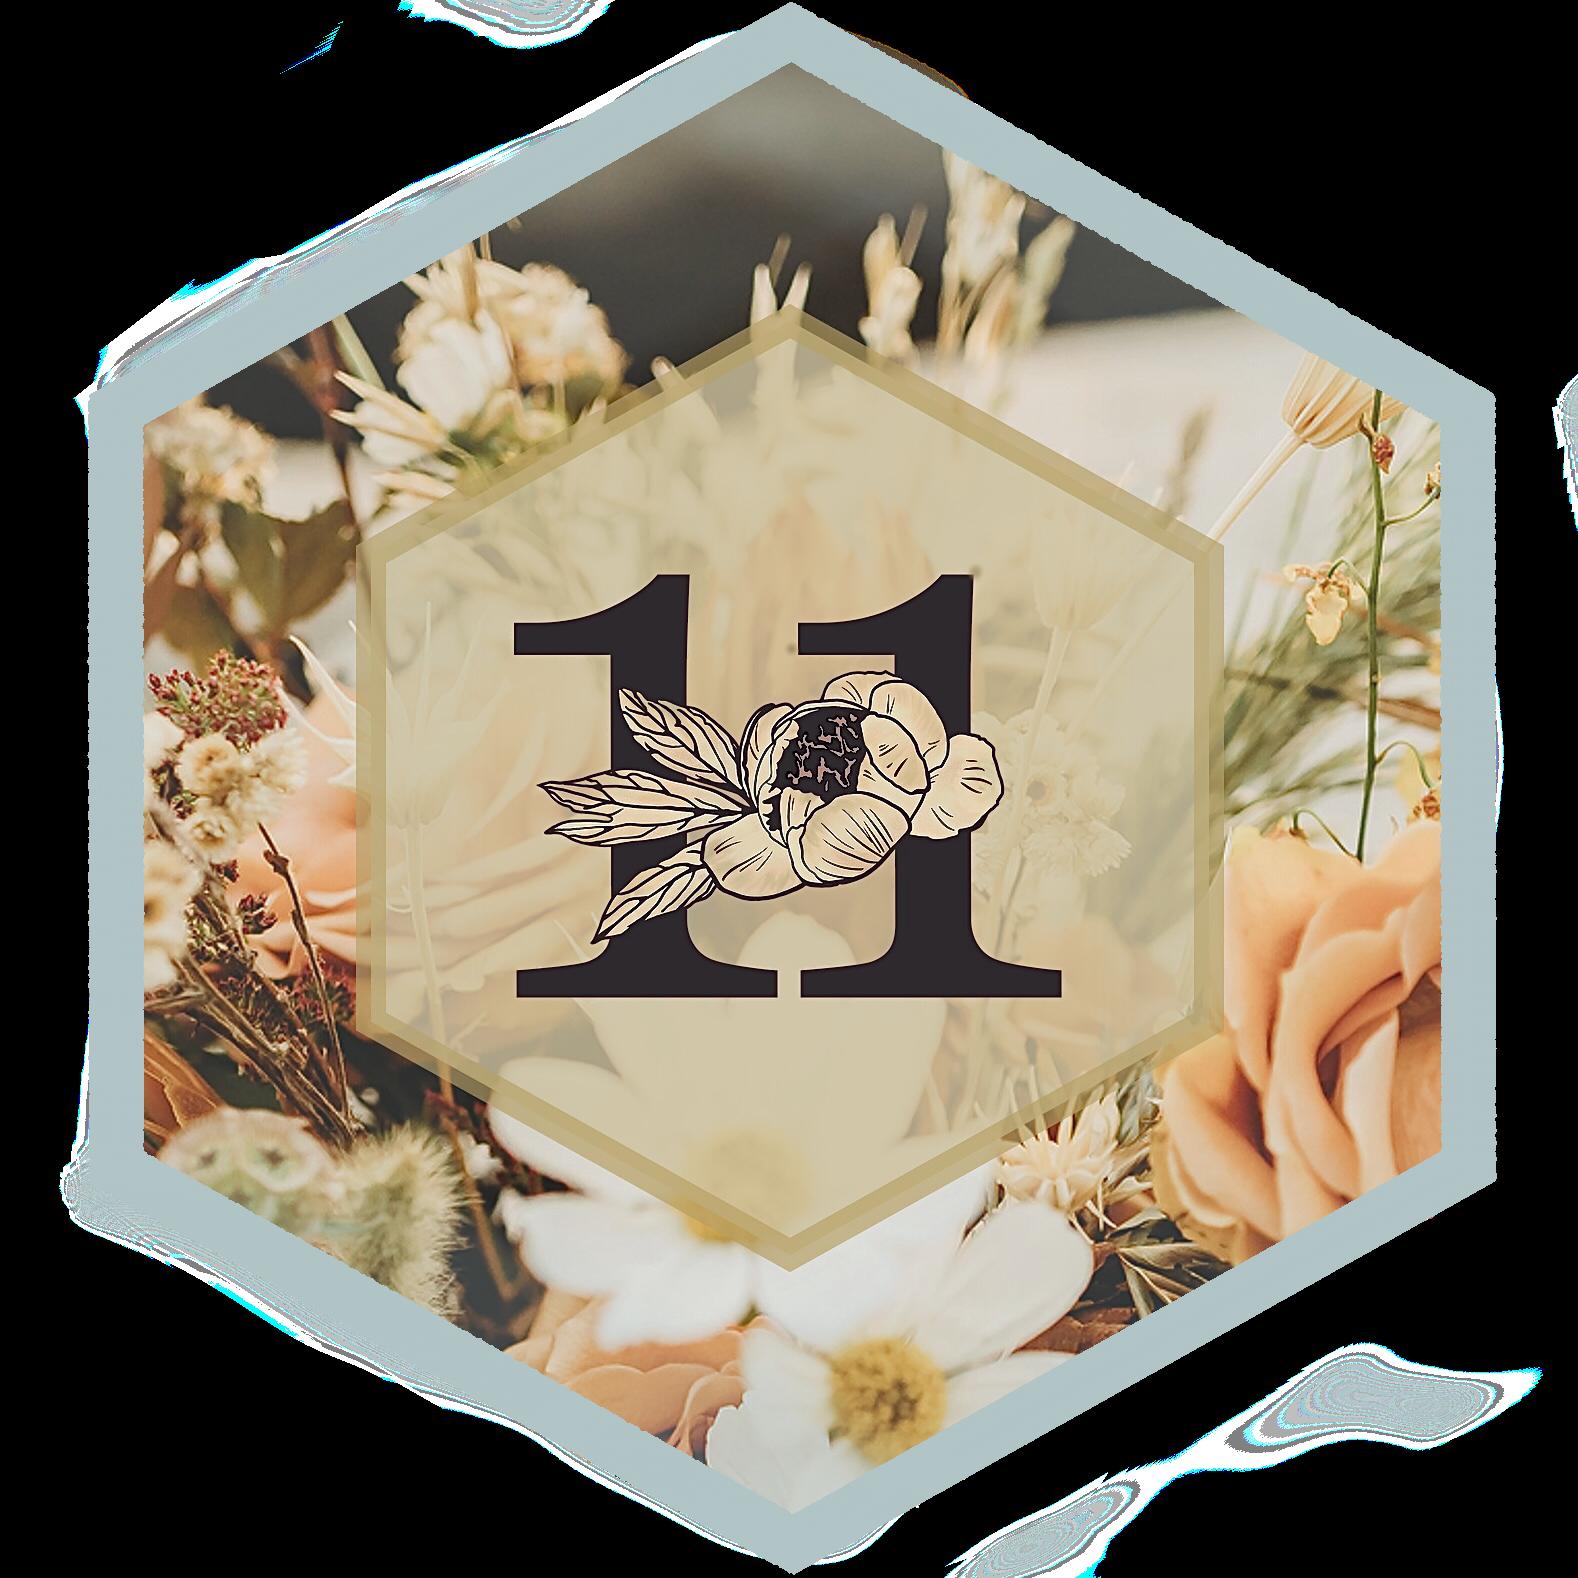 Eleven Blooms Floral Studio